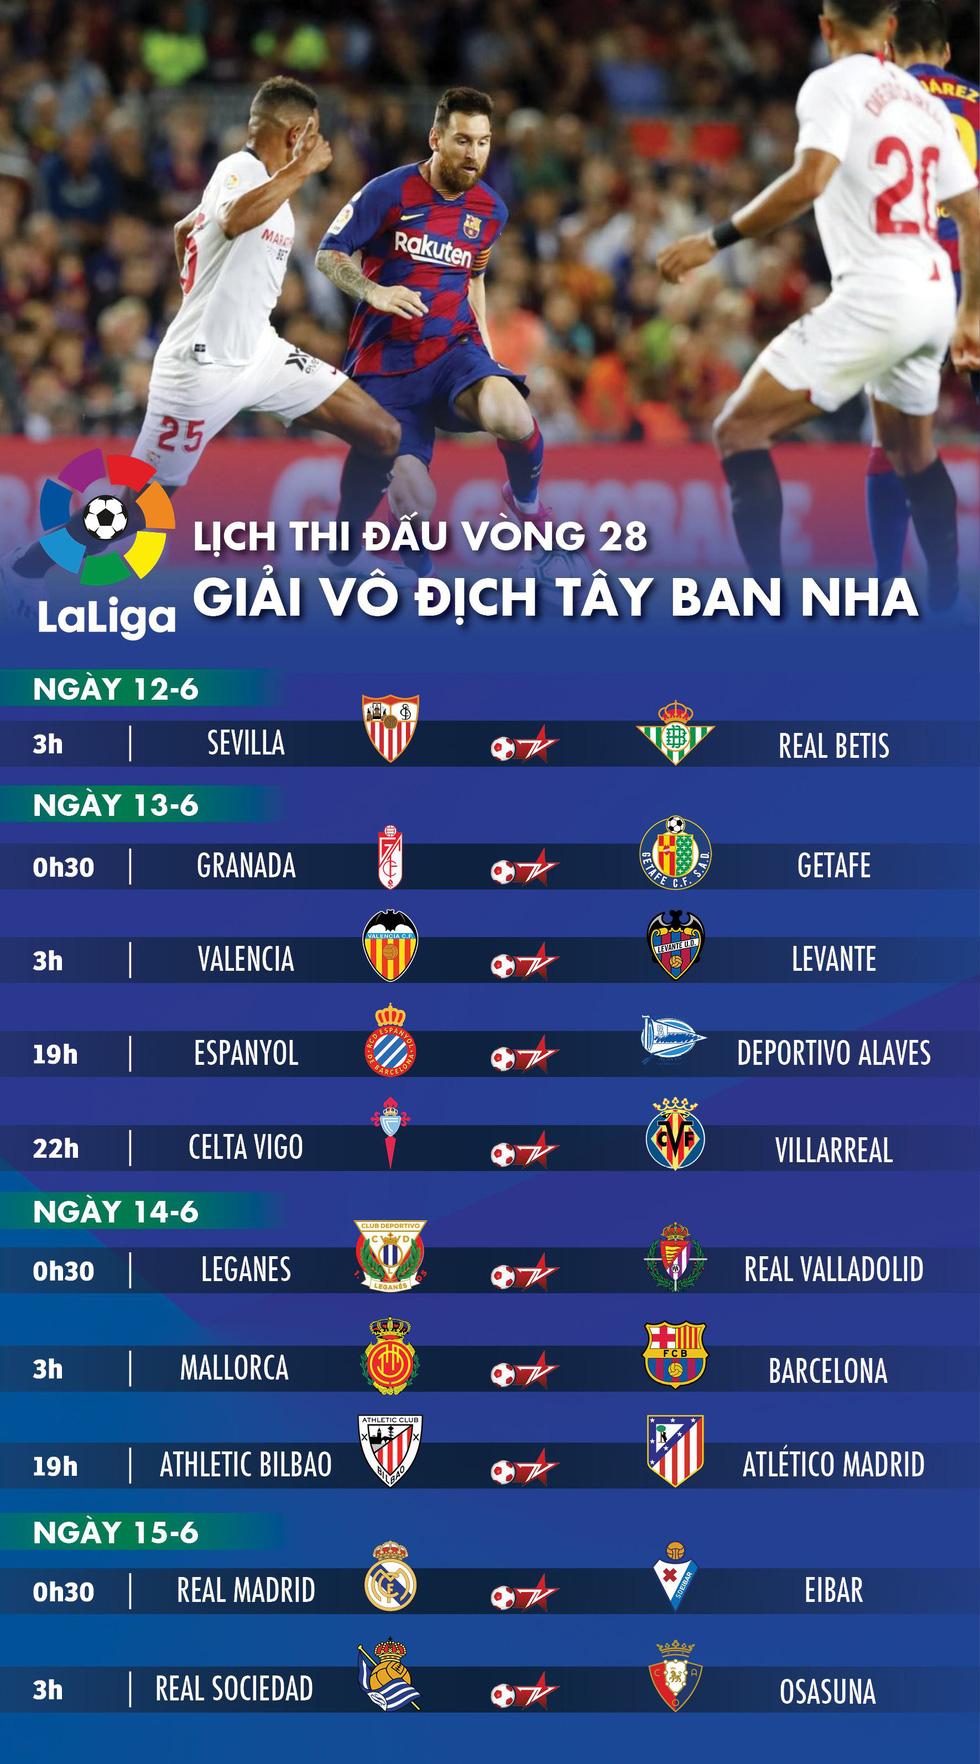 Lịch trực tiếp vòng 28 La Liga: Thế giới chờ La Liga trở lại - Ảnh 1.